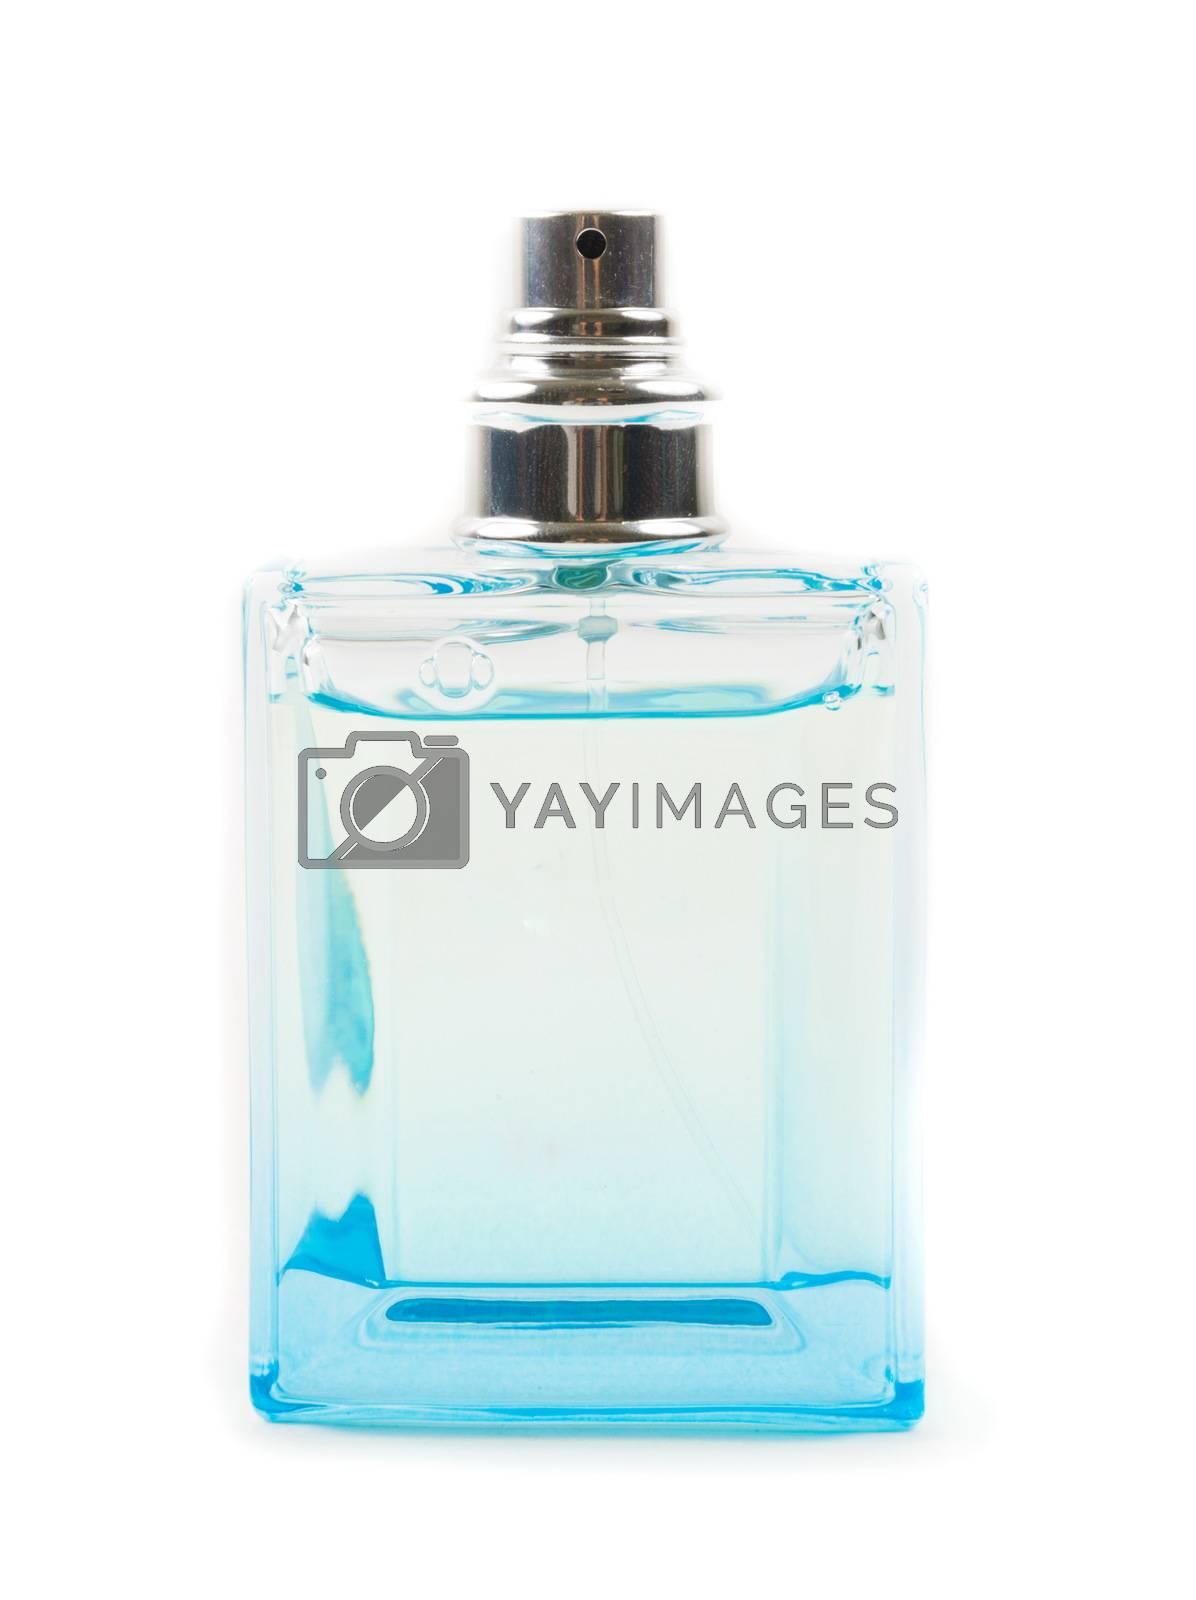 Bottle of perfume on the white background